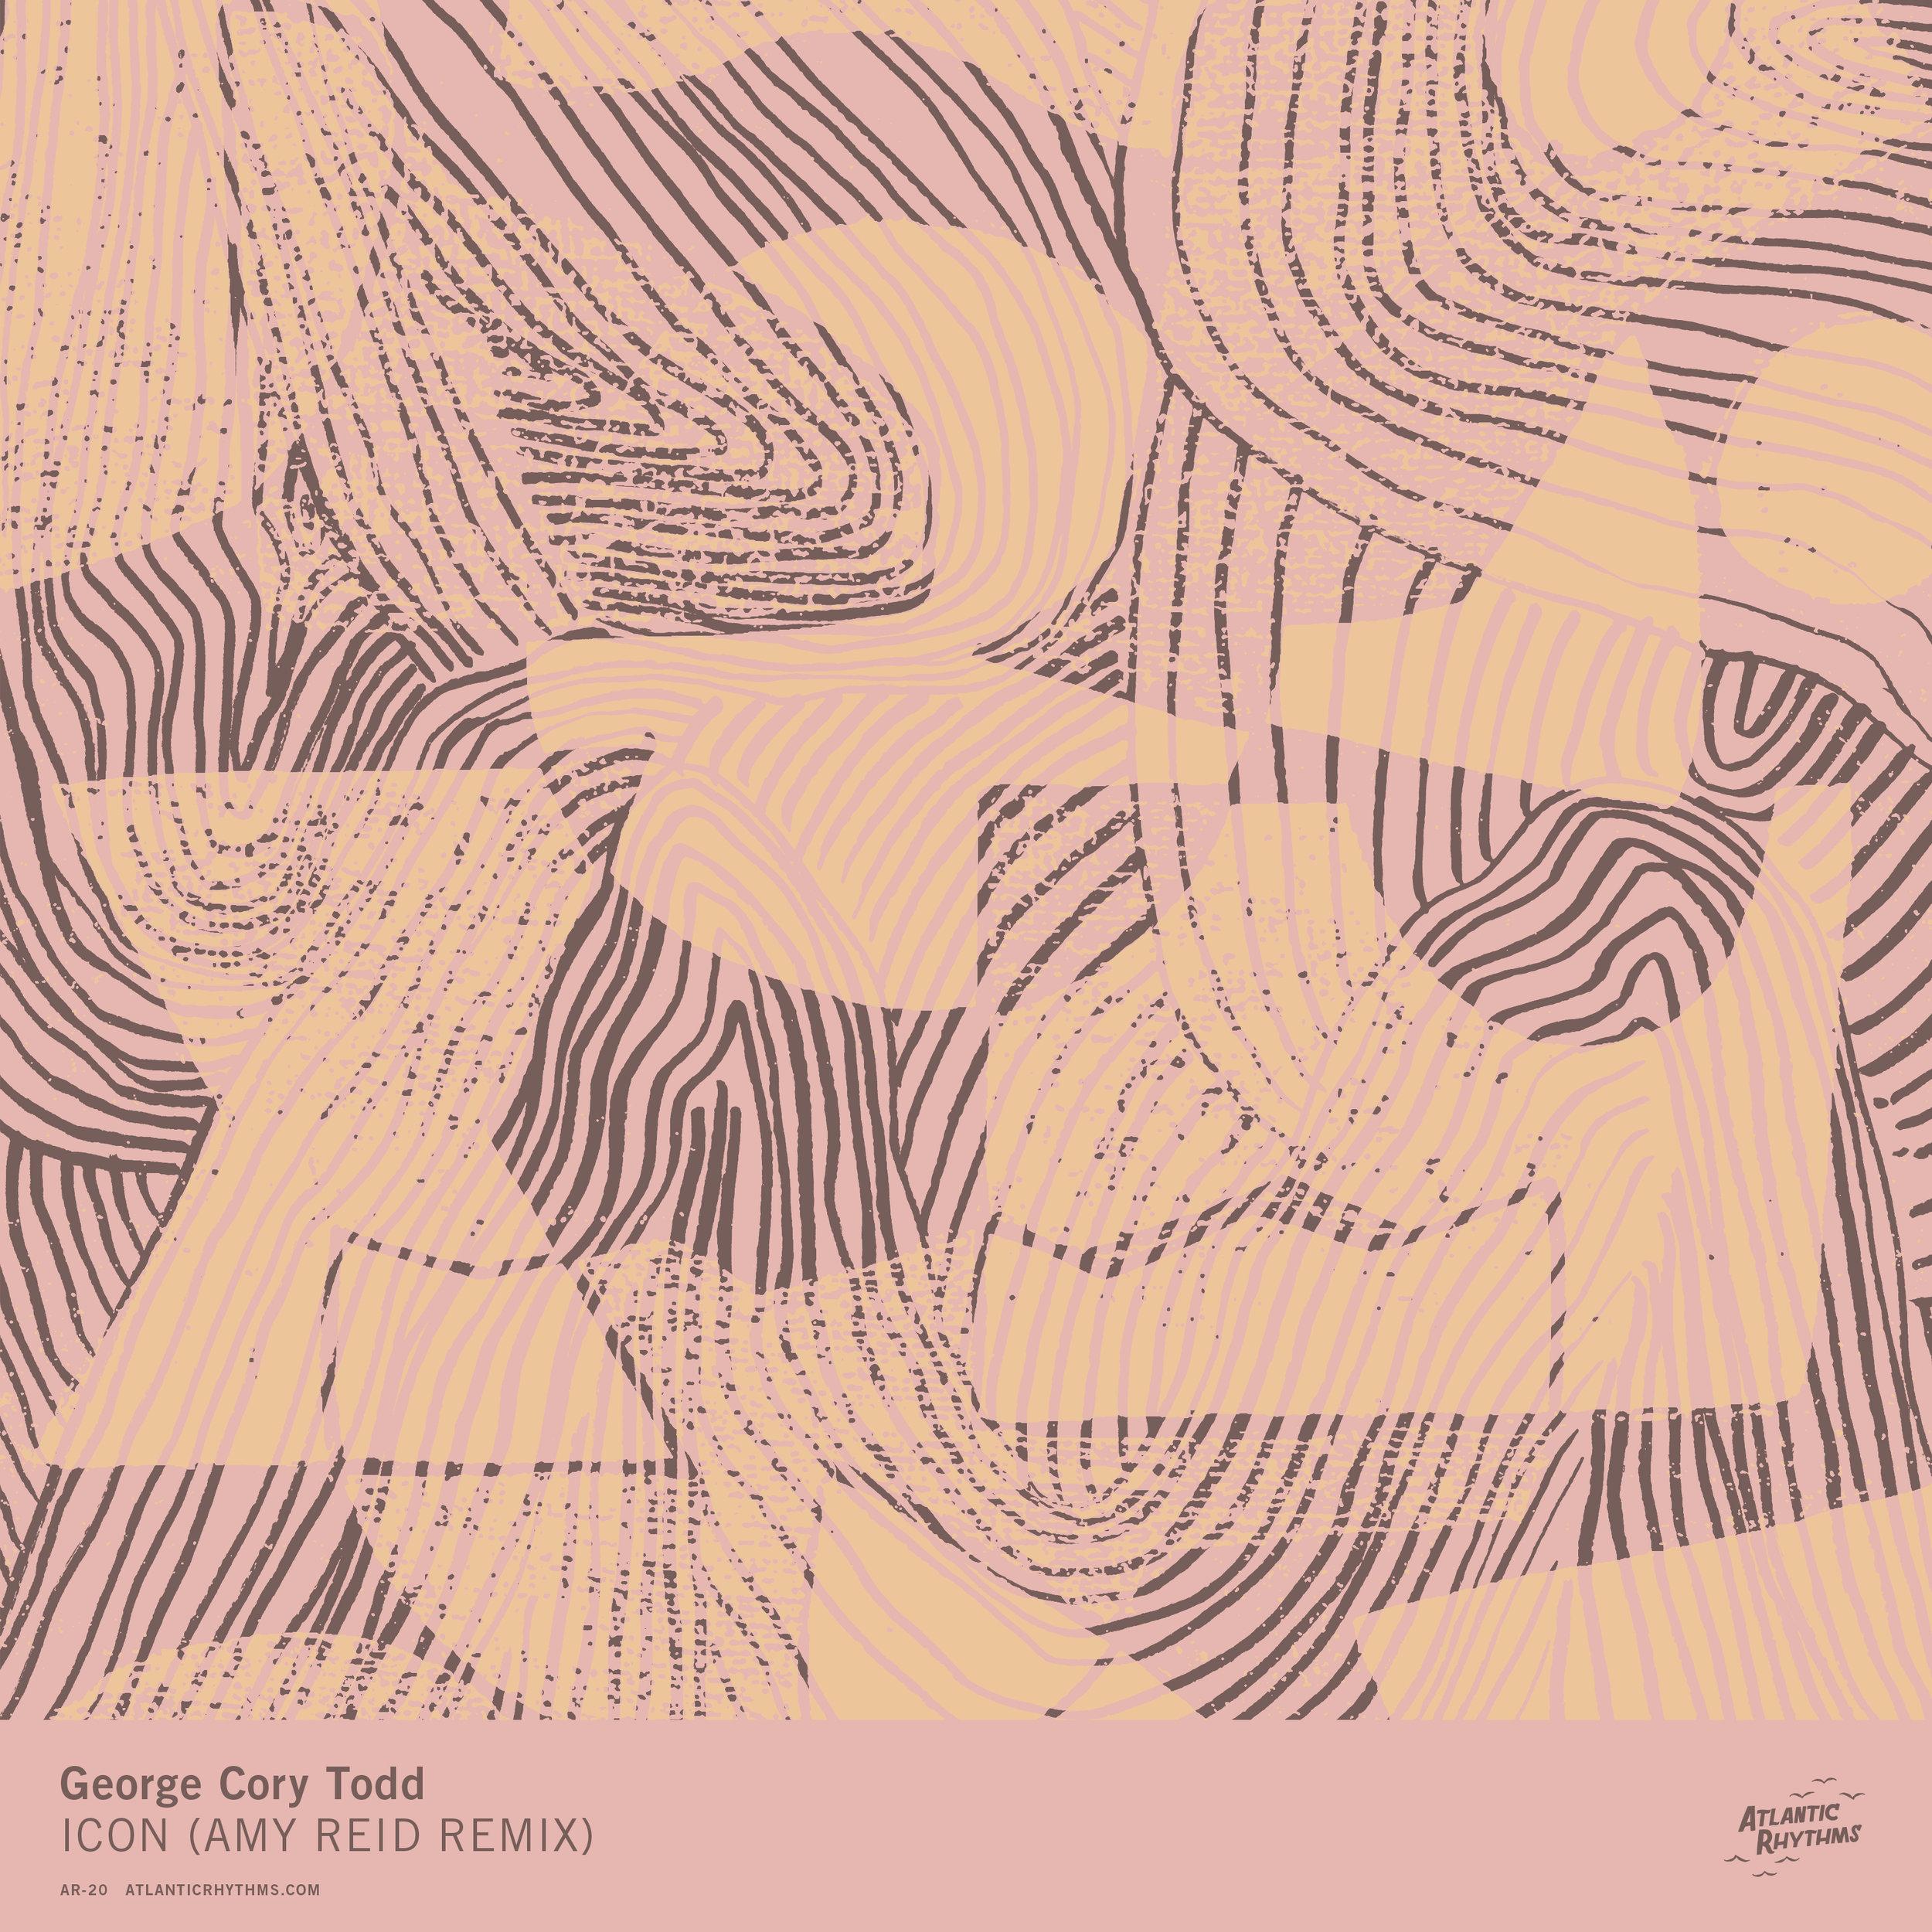 https://atlanticrhythms.bandcamp.com/album/icon-amy-reid-remix